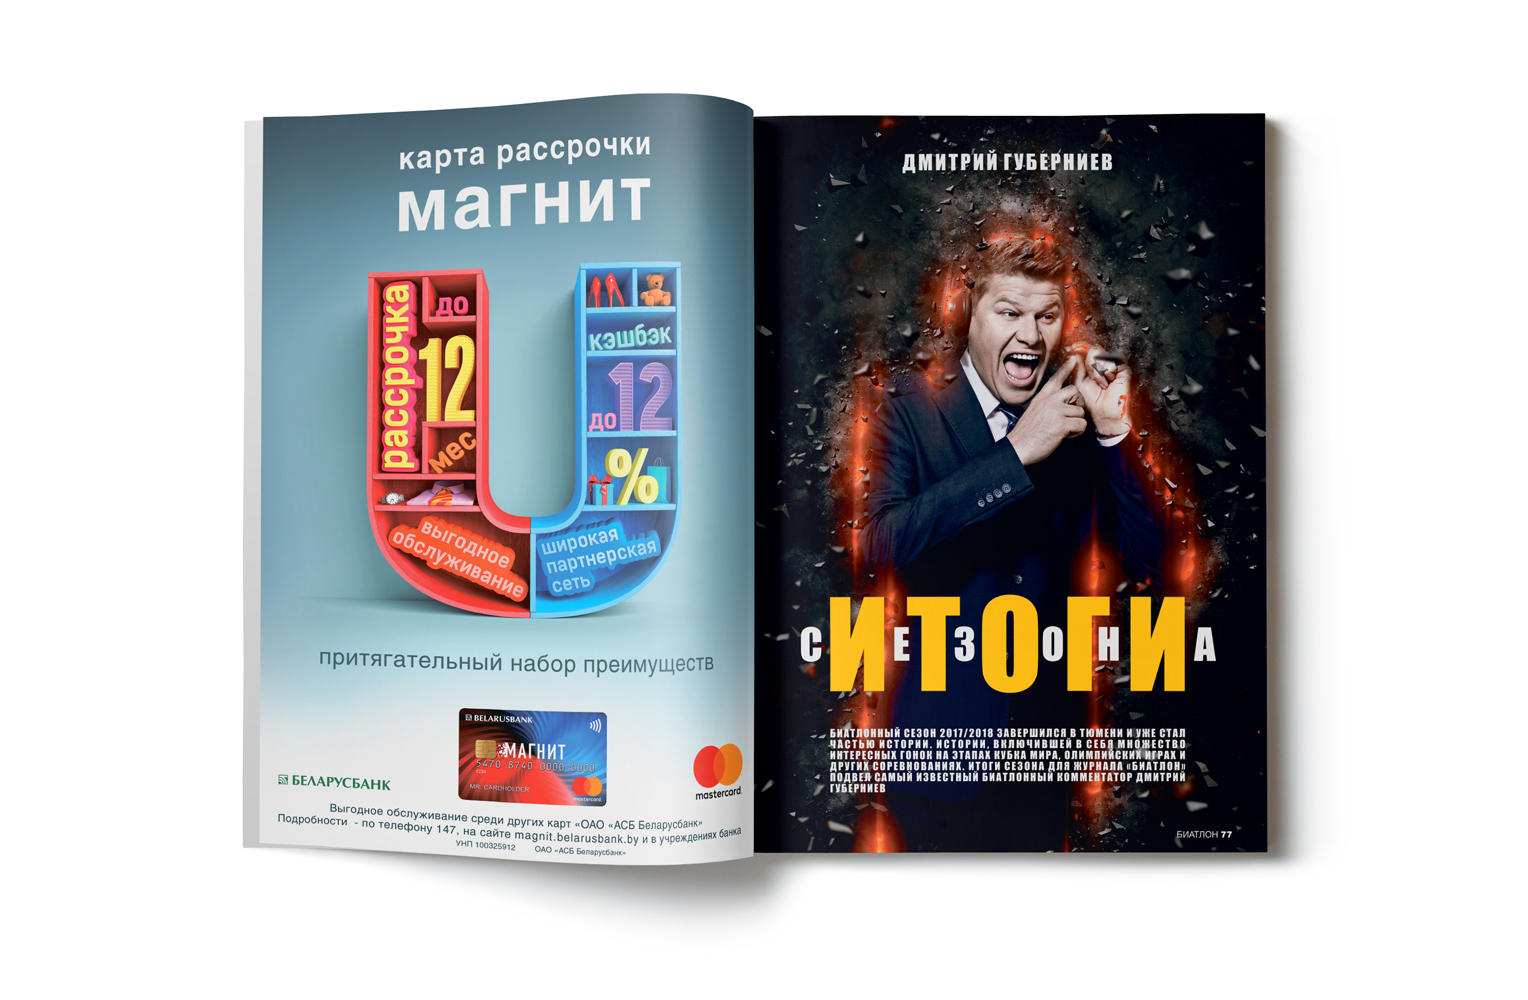 biathlon-magazine-pages-4